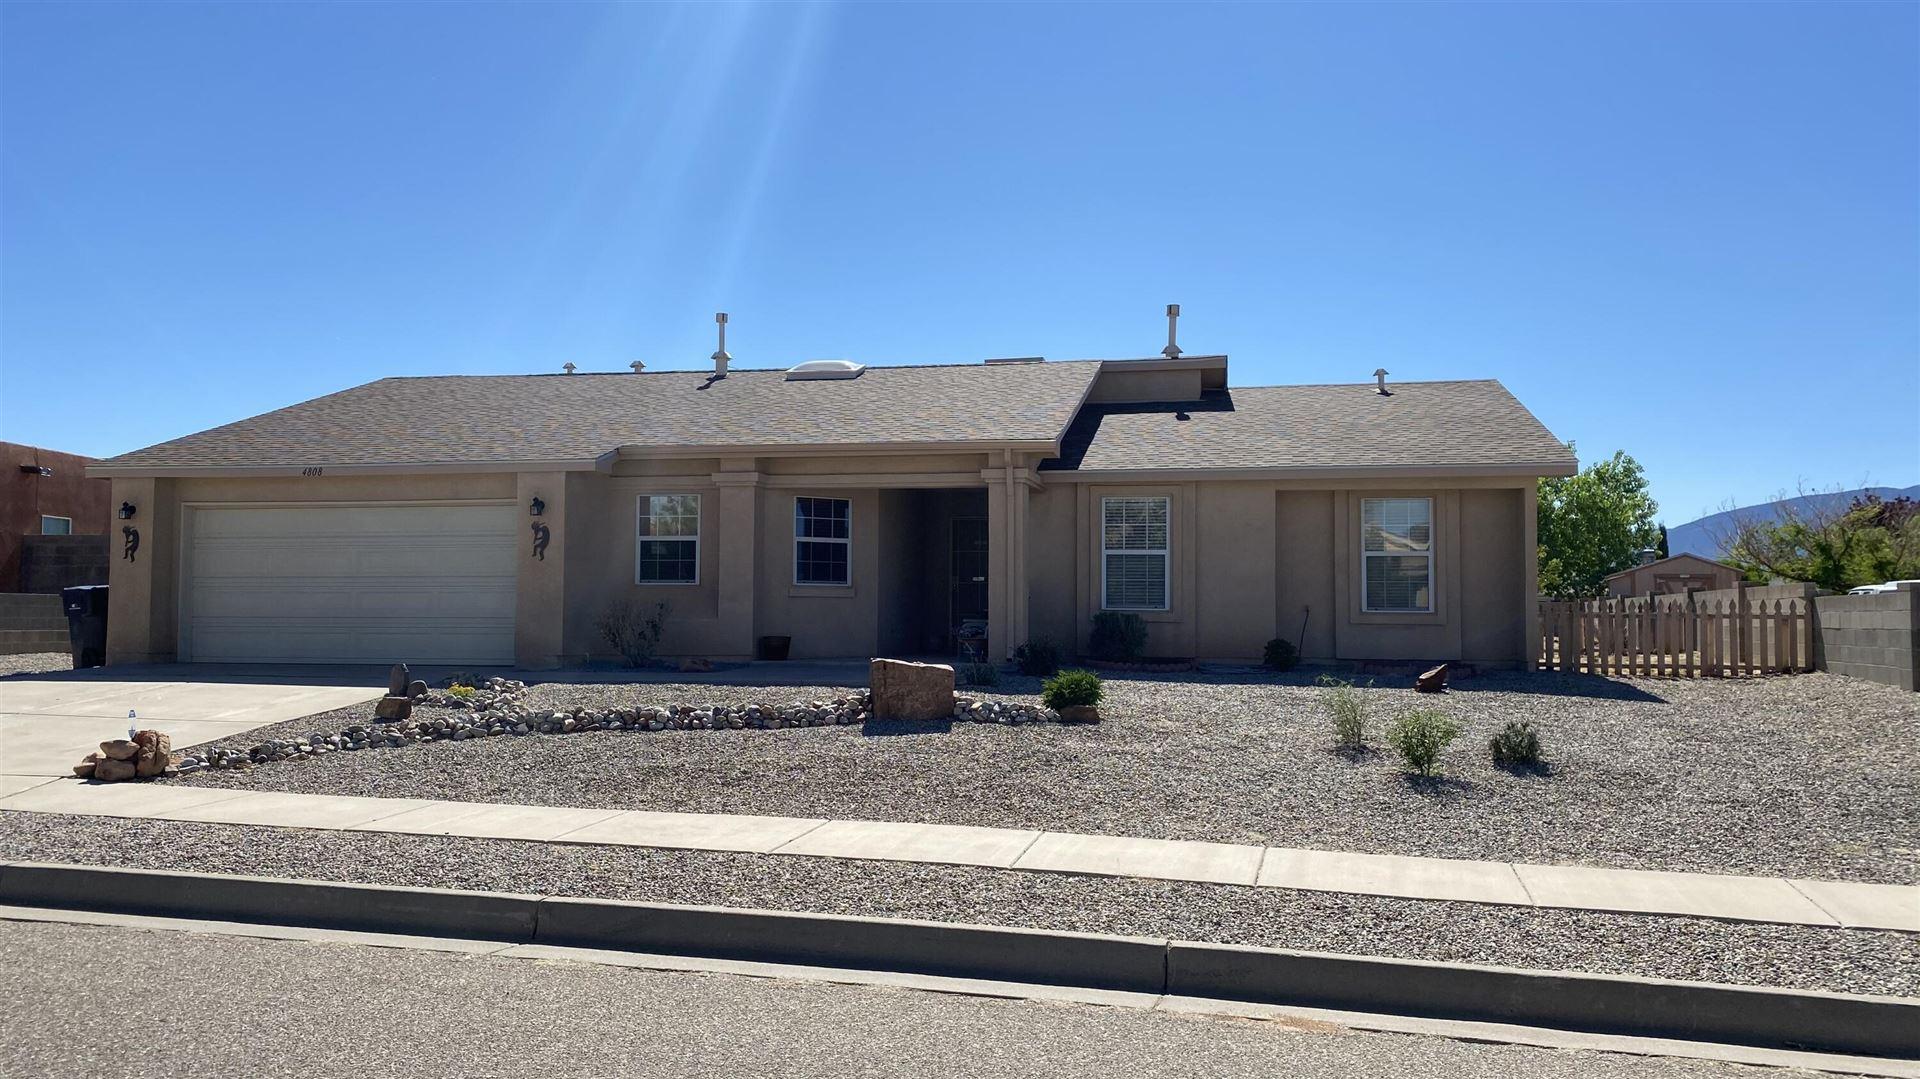 Photo of 4808 AUBRY HILLS Drive NE, Rio Rancho, NM 87144 (MLS # 992817)